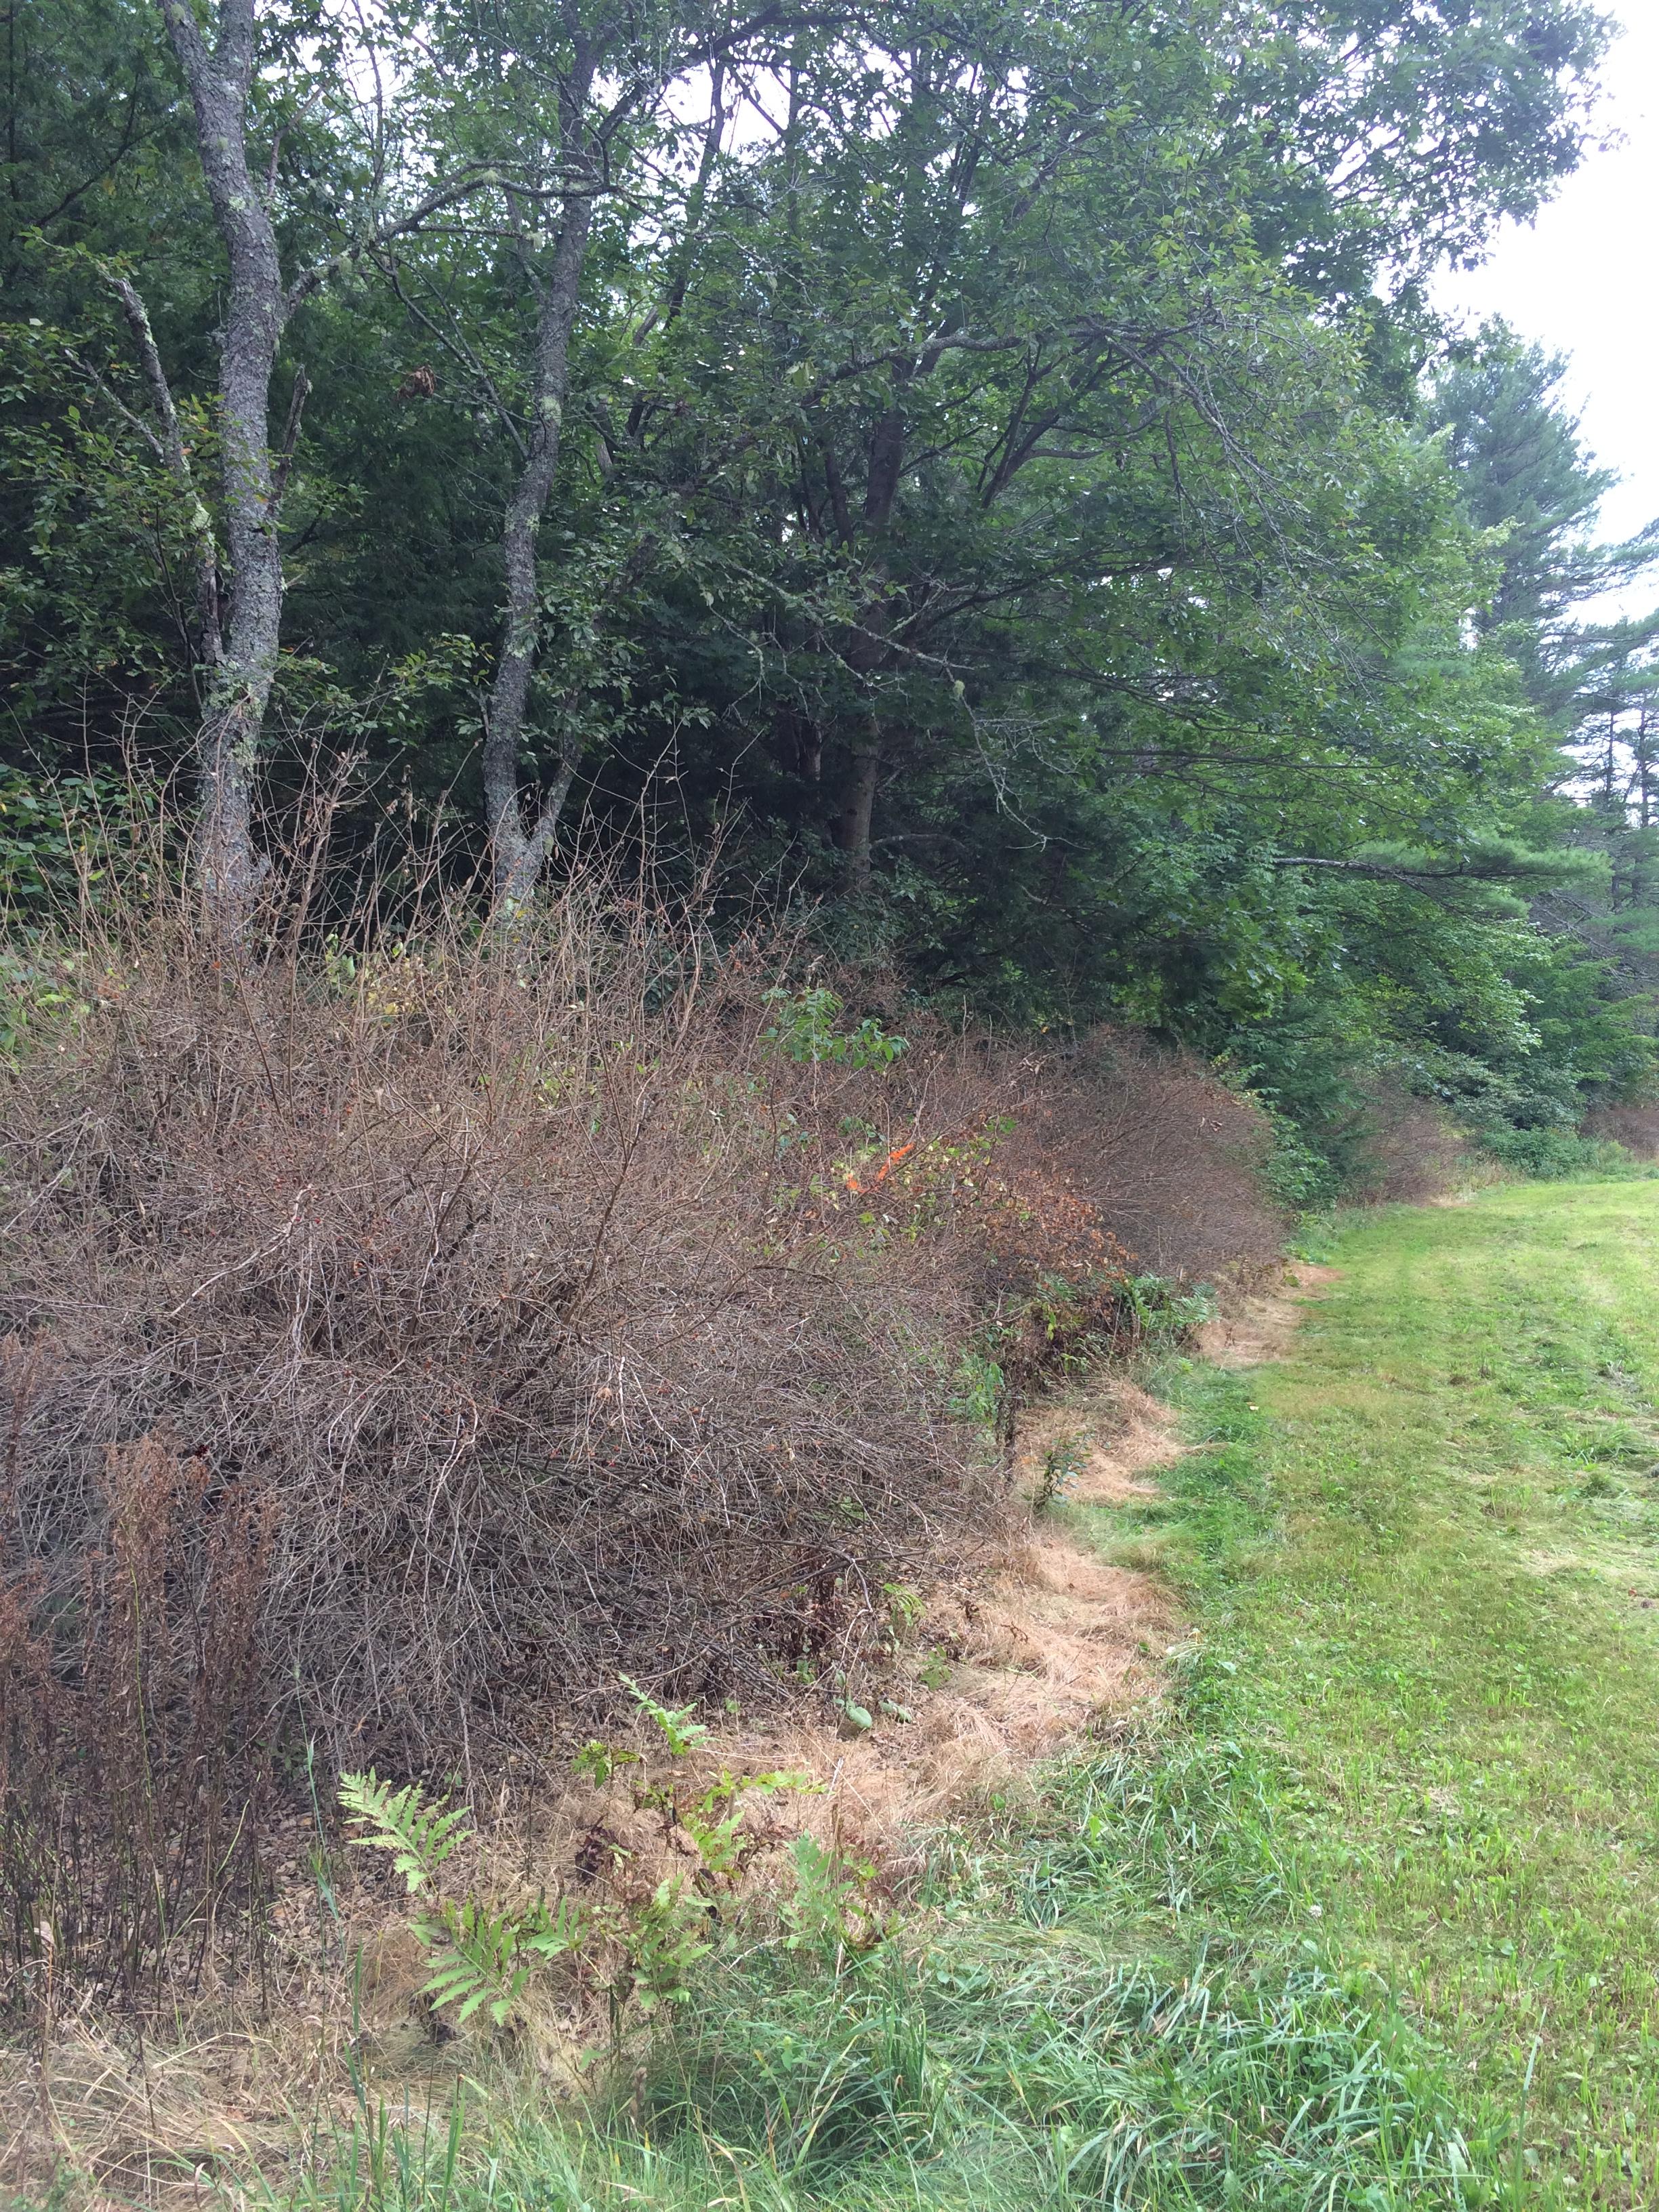 Chemically treated honeysuckle along a forest edge.